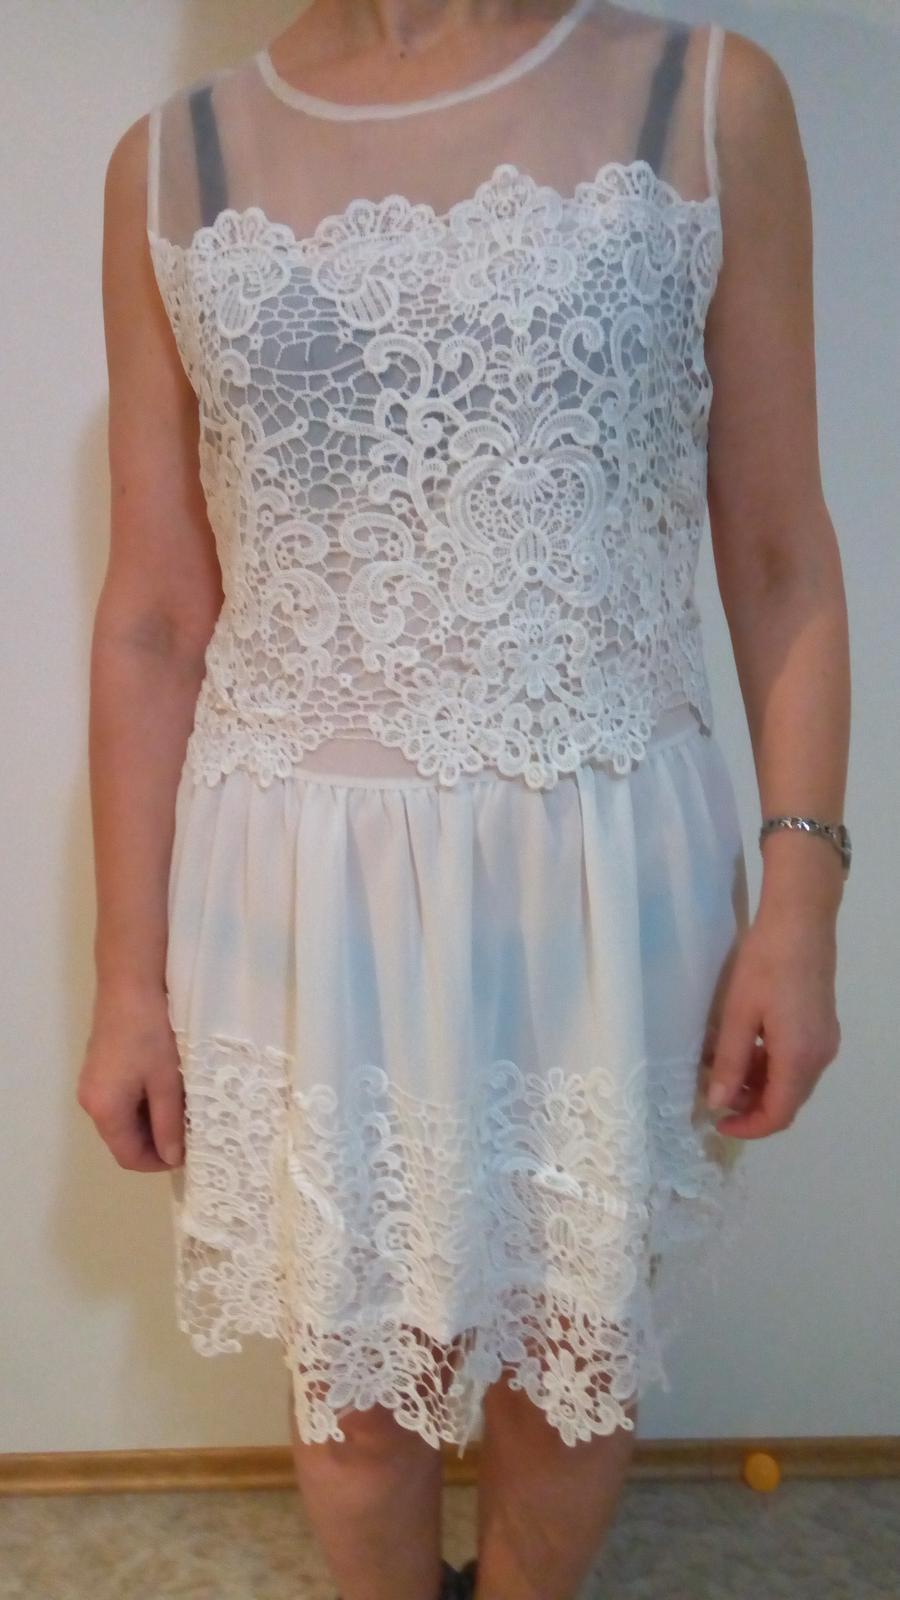 biele šaty M - Obrázok č. 1